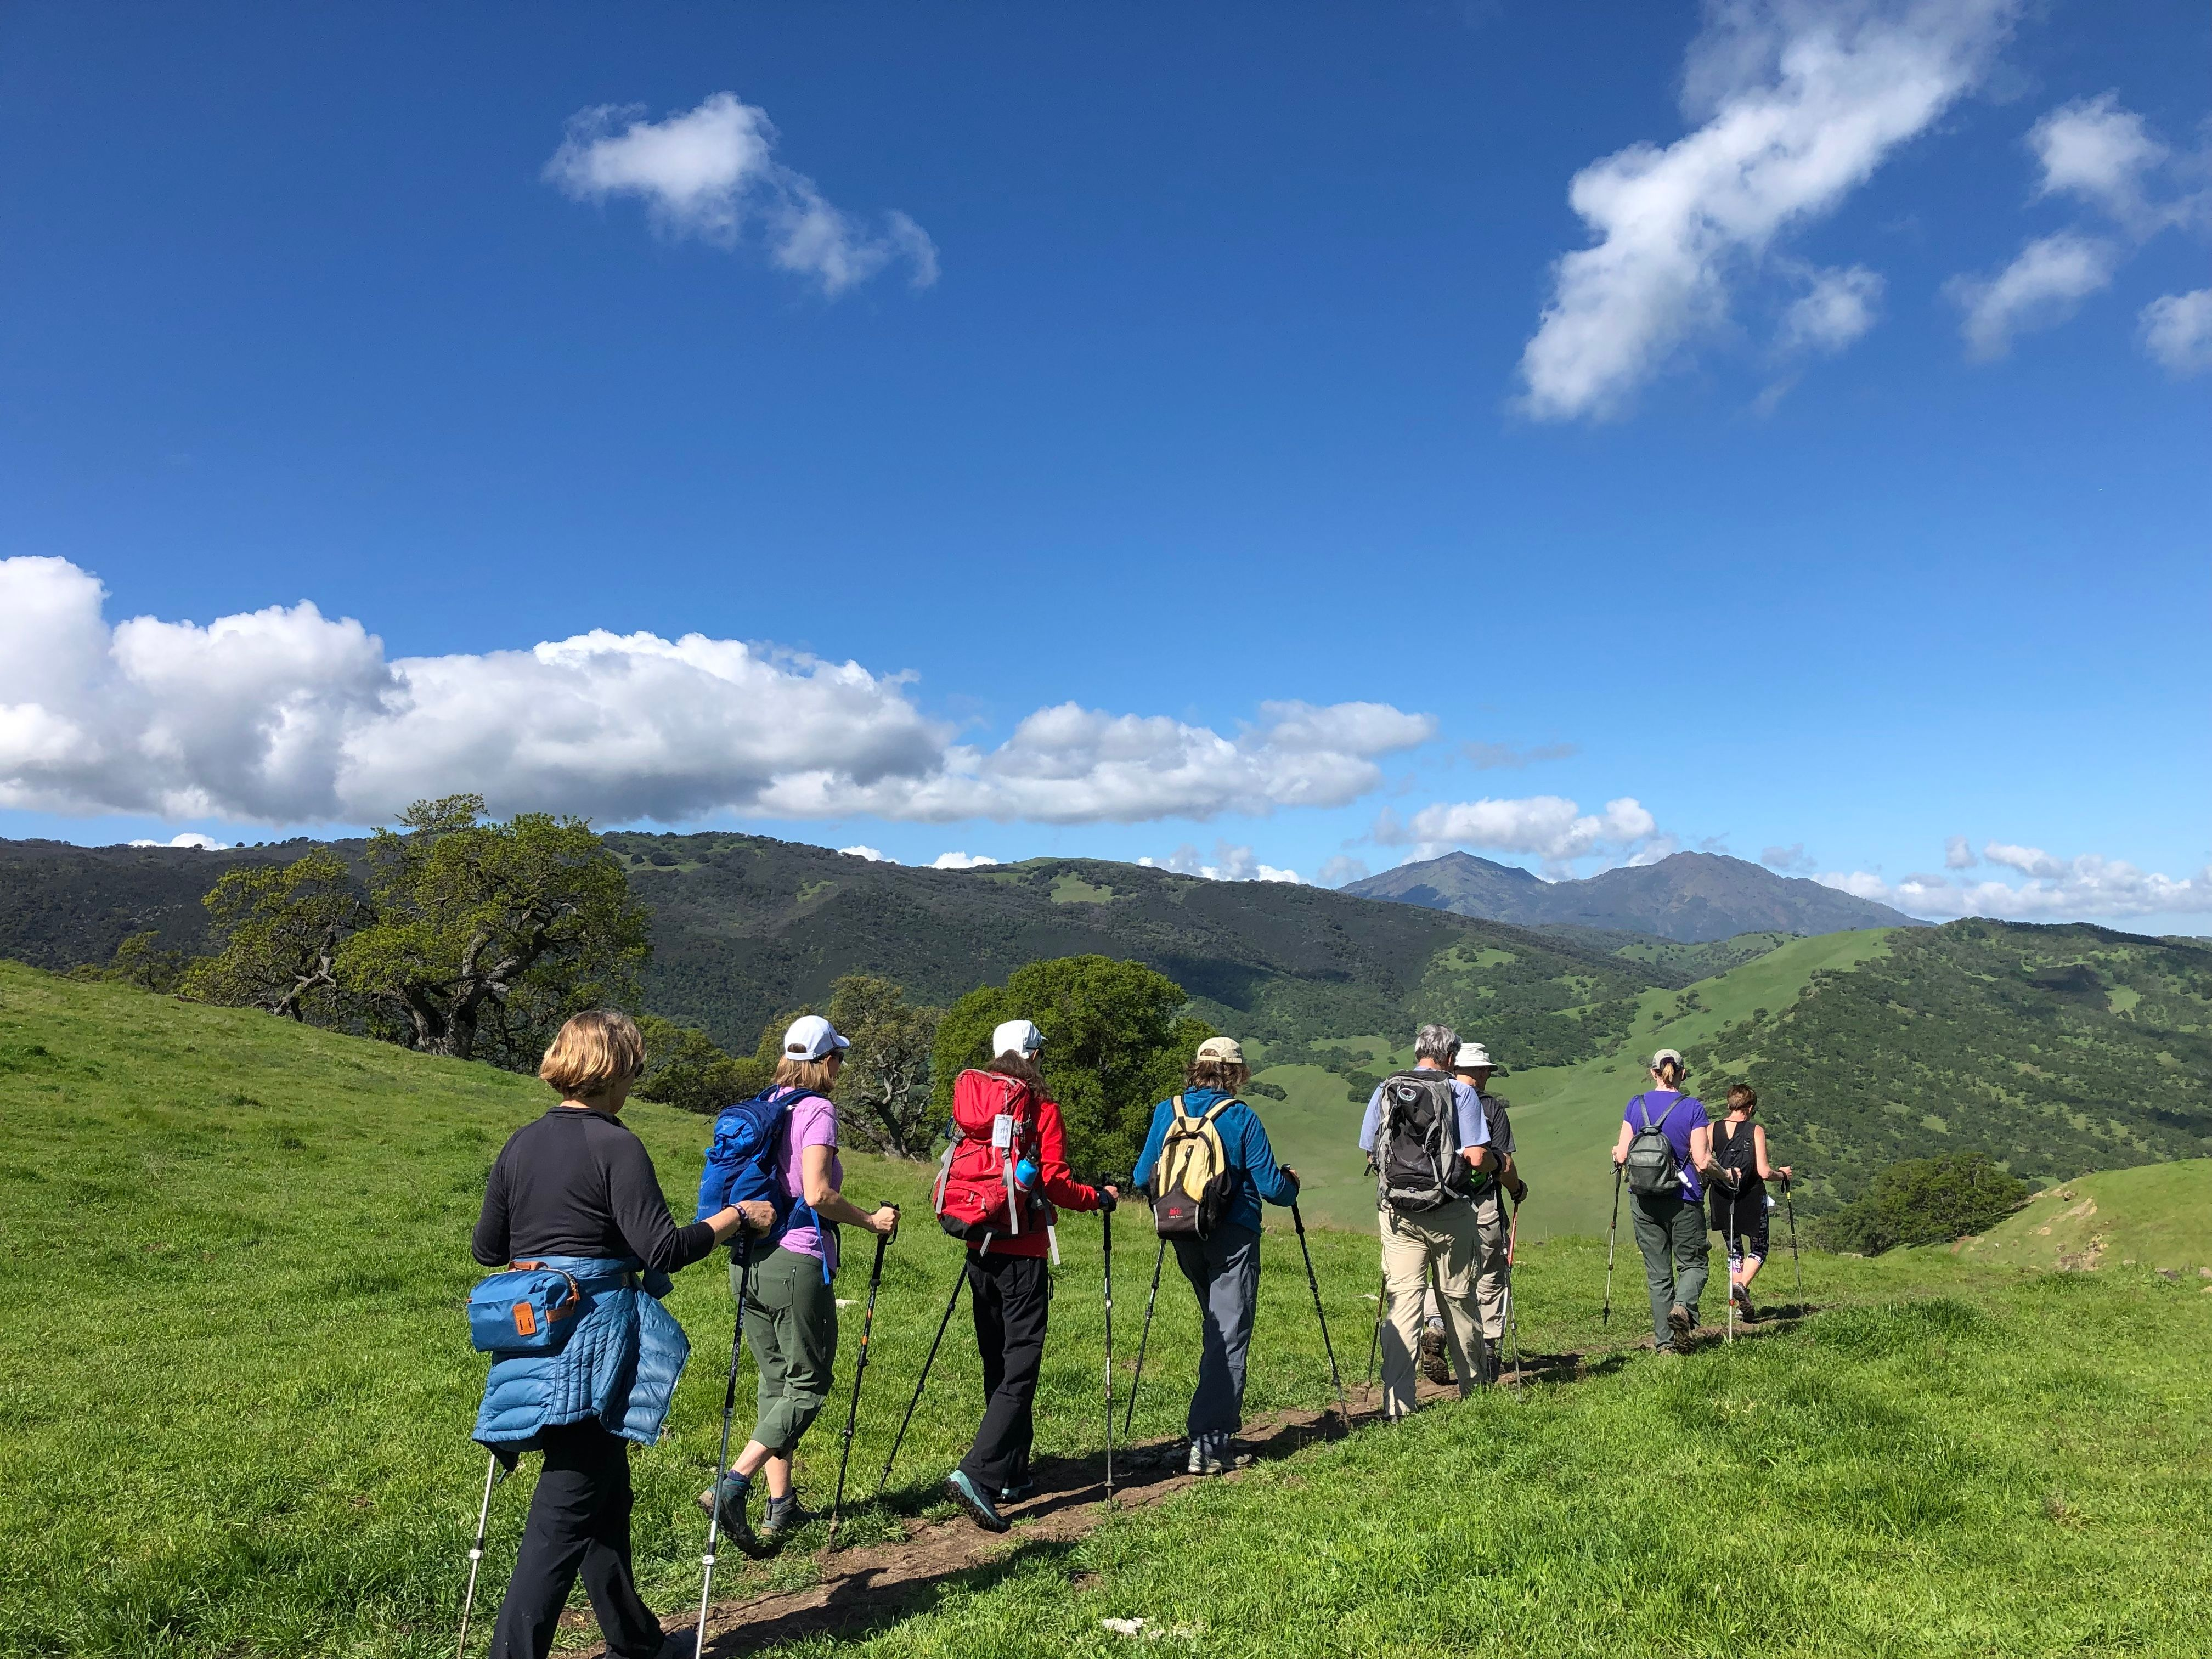 East Bay Hiking Meetup